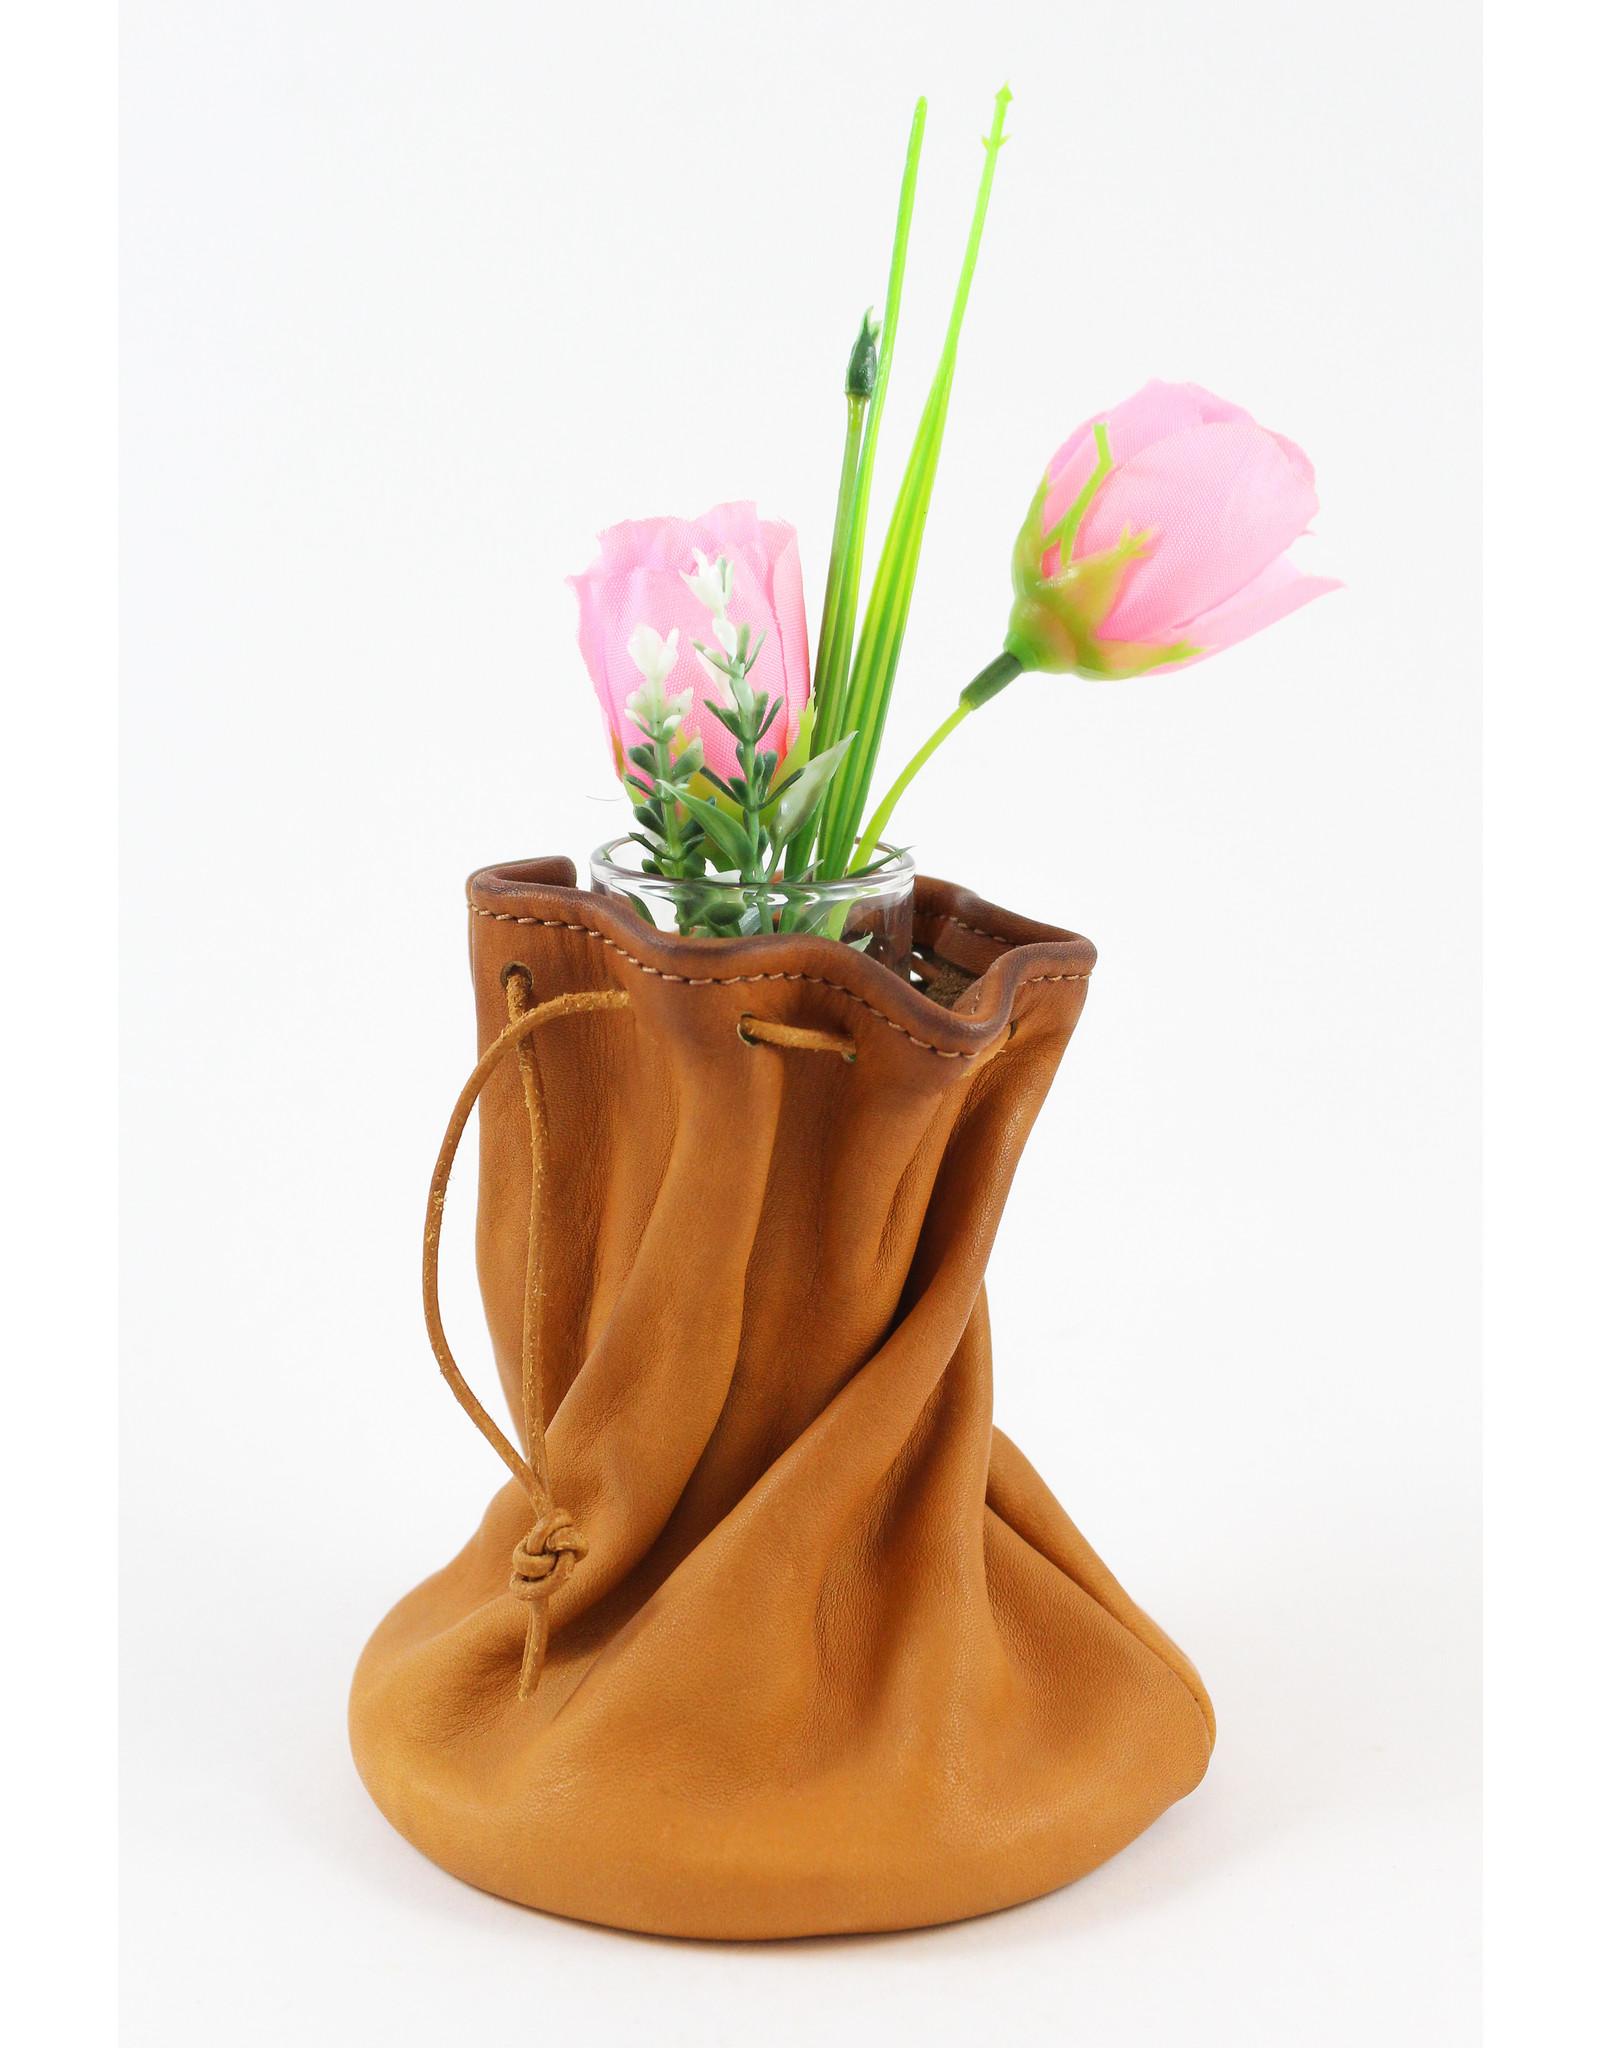 Jolene Dauphney Small Flower Vase by Leather Works